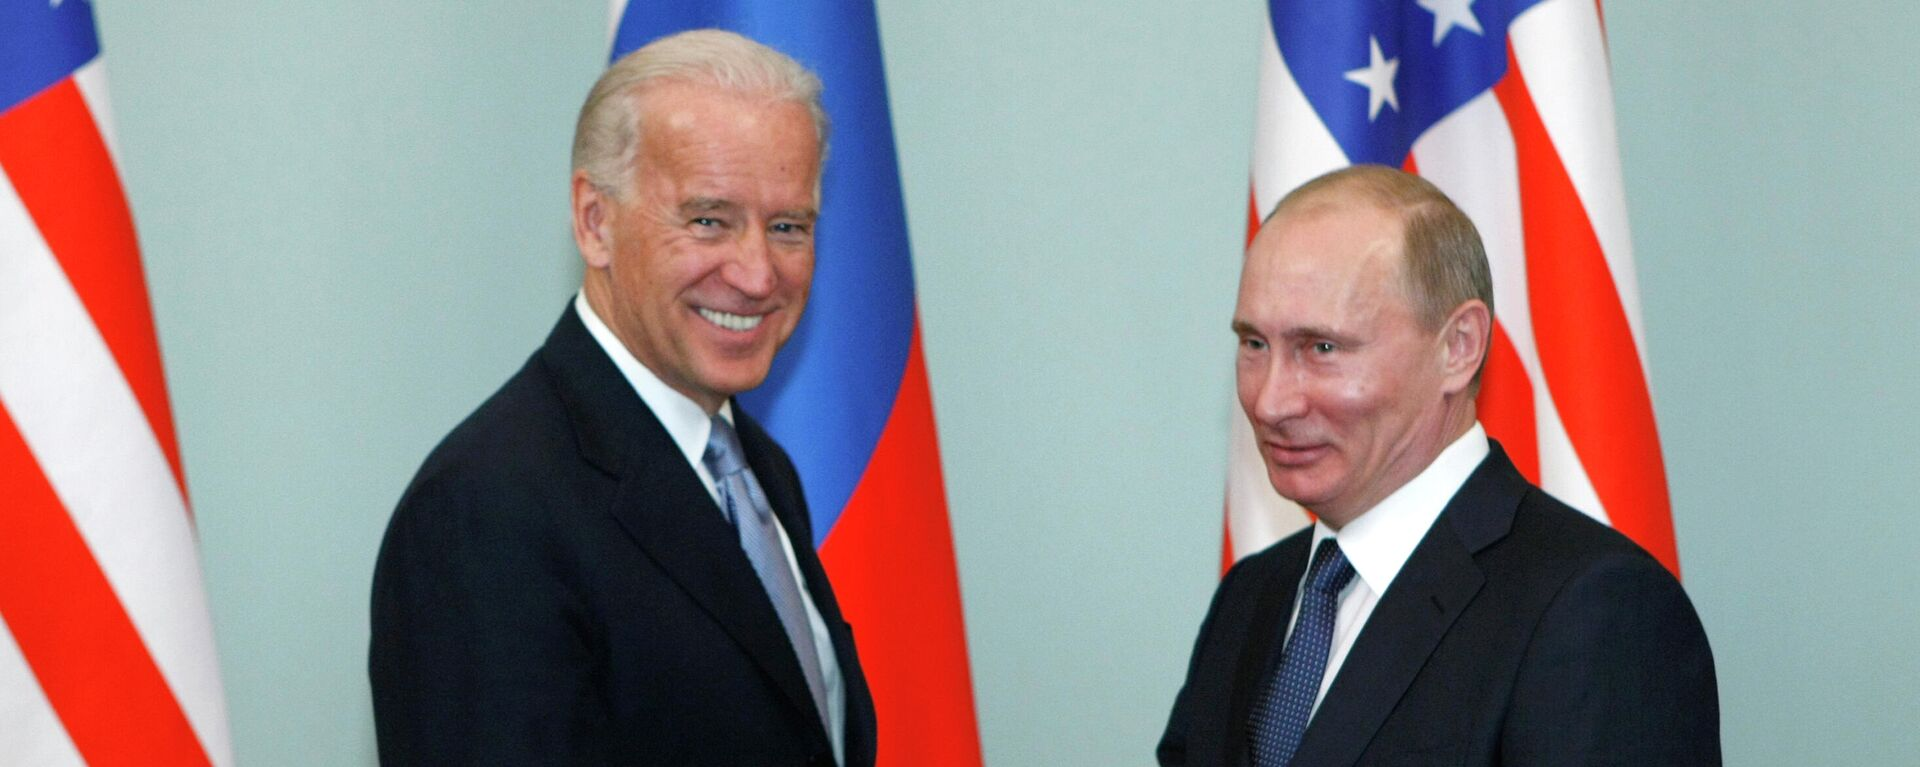 Joe Biden y Vladímir Putin (archivo) - Sputnik Mundo, 1920, 08.06.2021